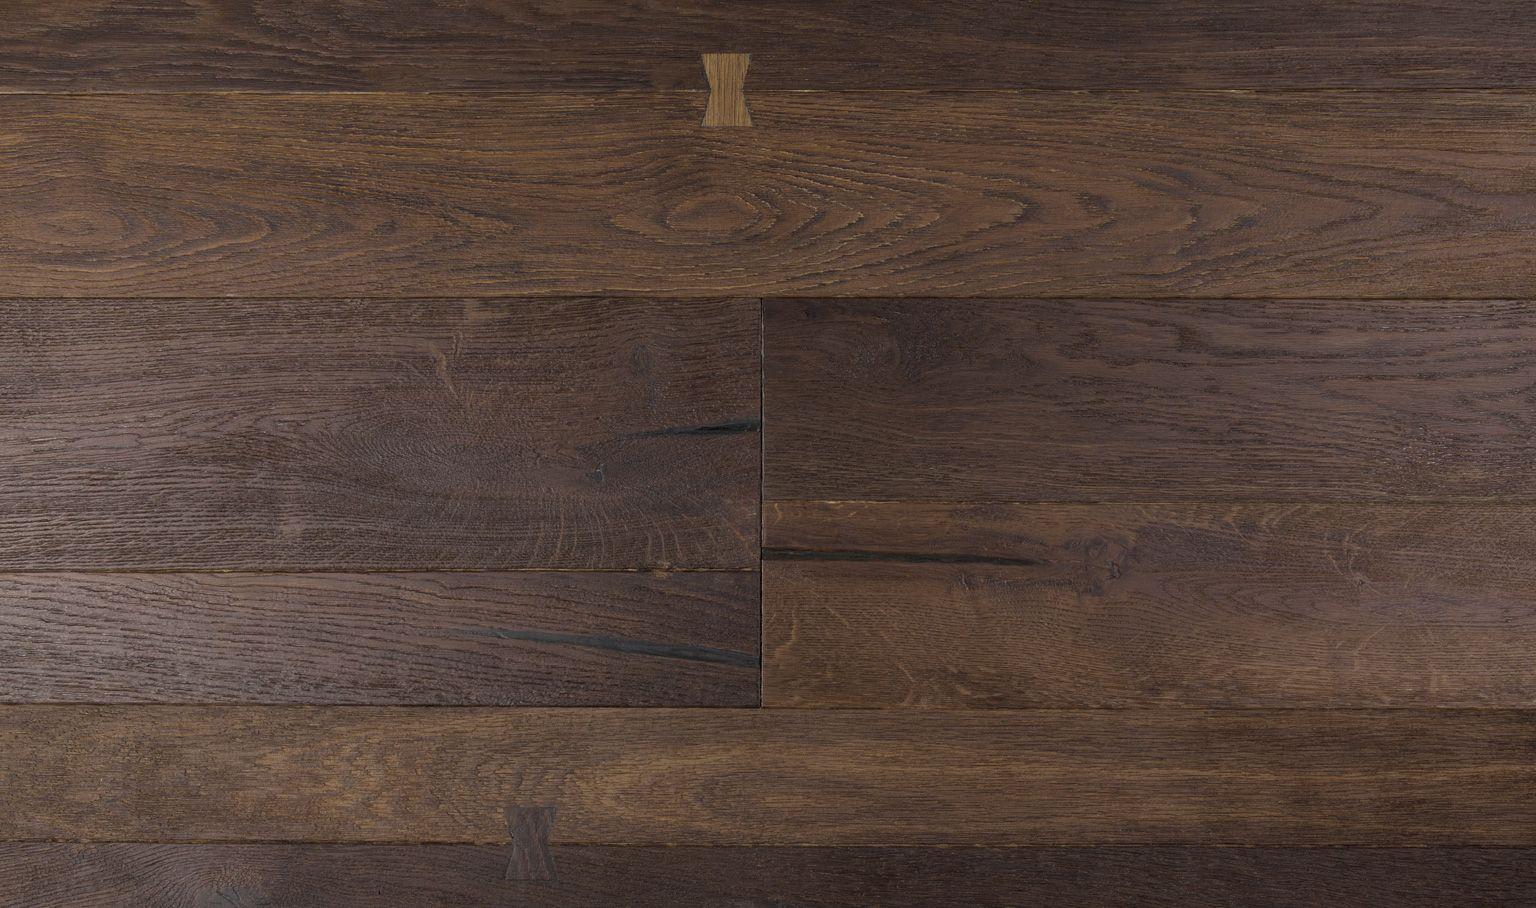 Mozart Wide Oak Hardwood Flooring Dark Engineered Wood Floors Dark Engineered Wood Floors Oak Hardwood Hardwood Floors